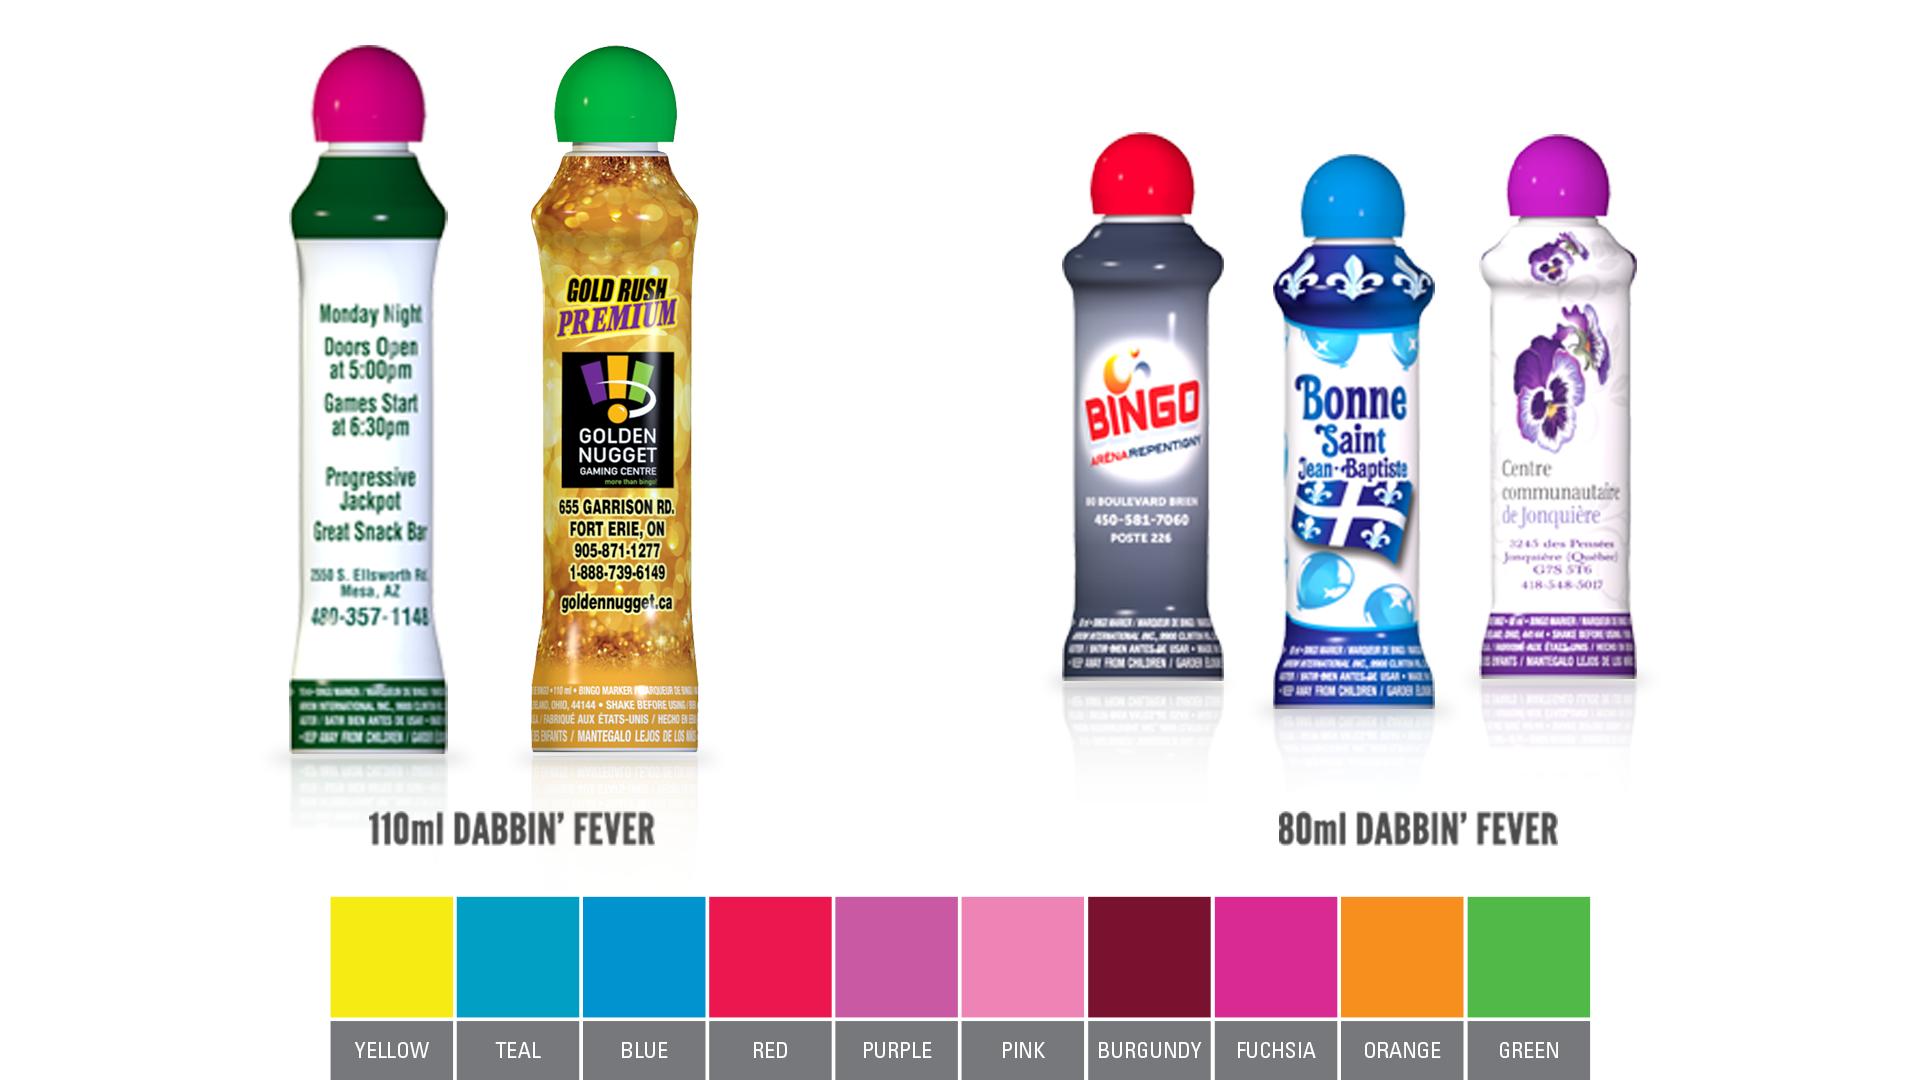 Dabbin Fever Bingo Ink